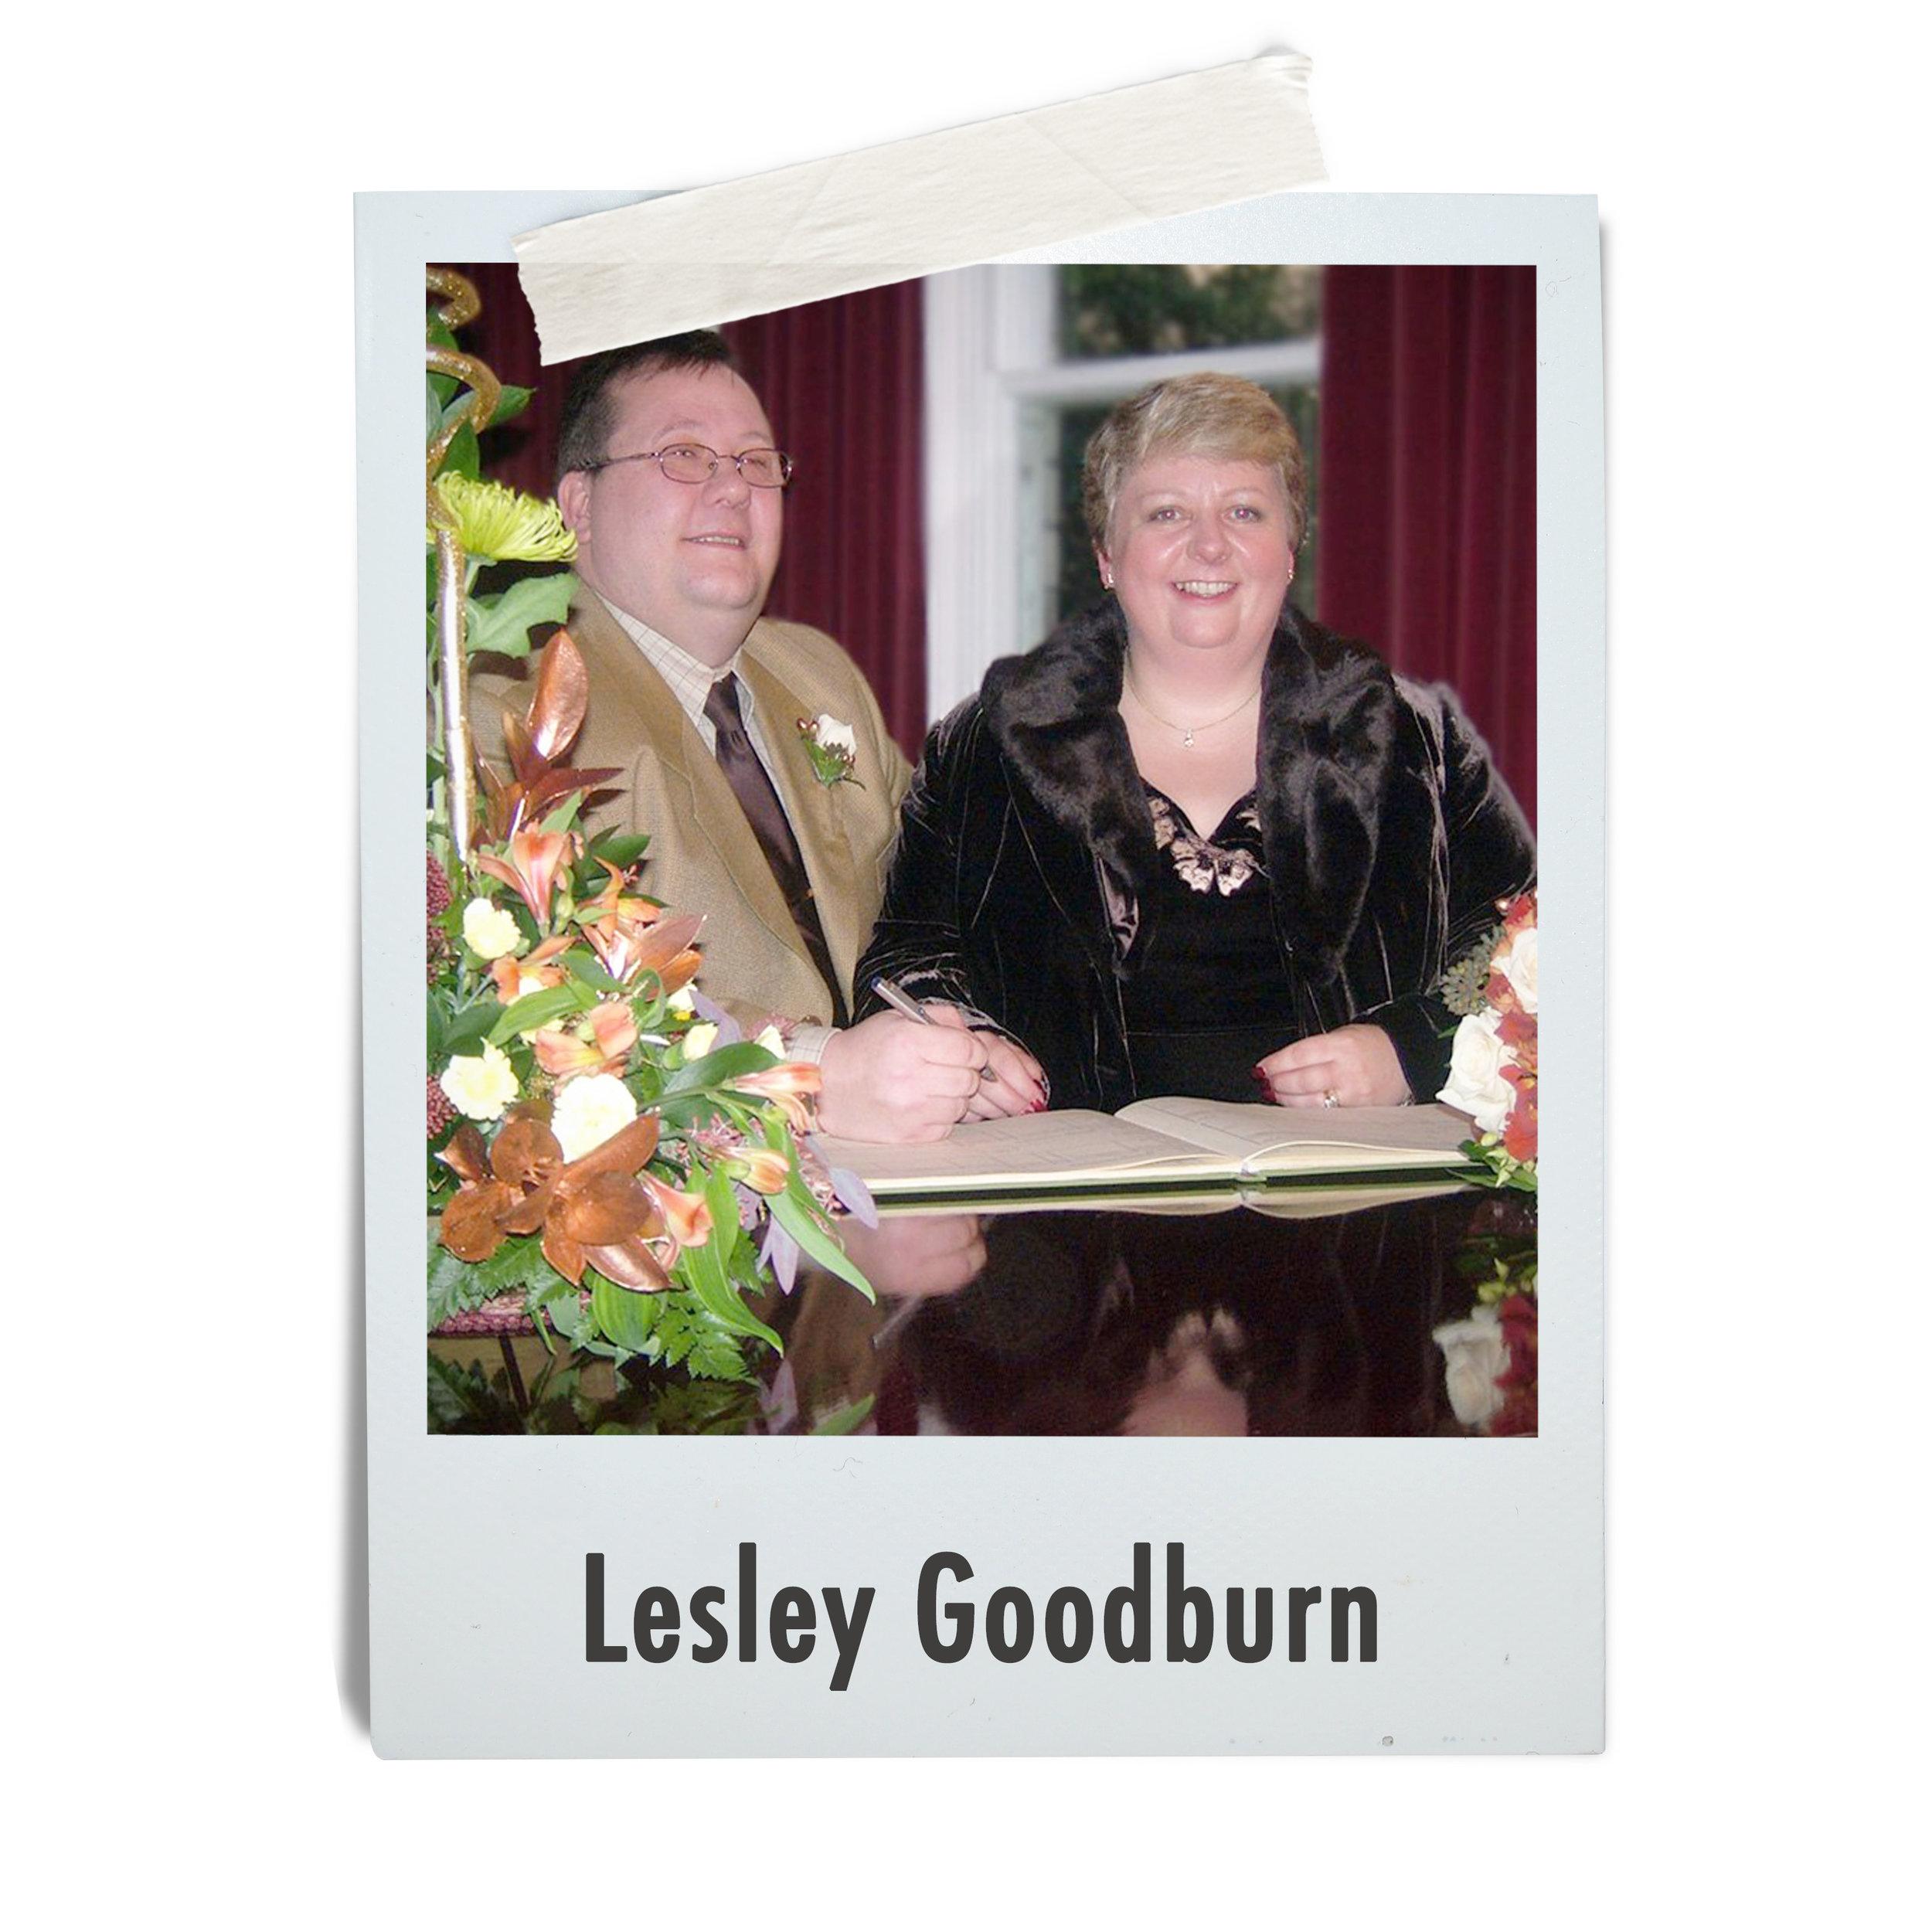 Lesley Goodburn